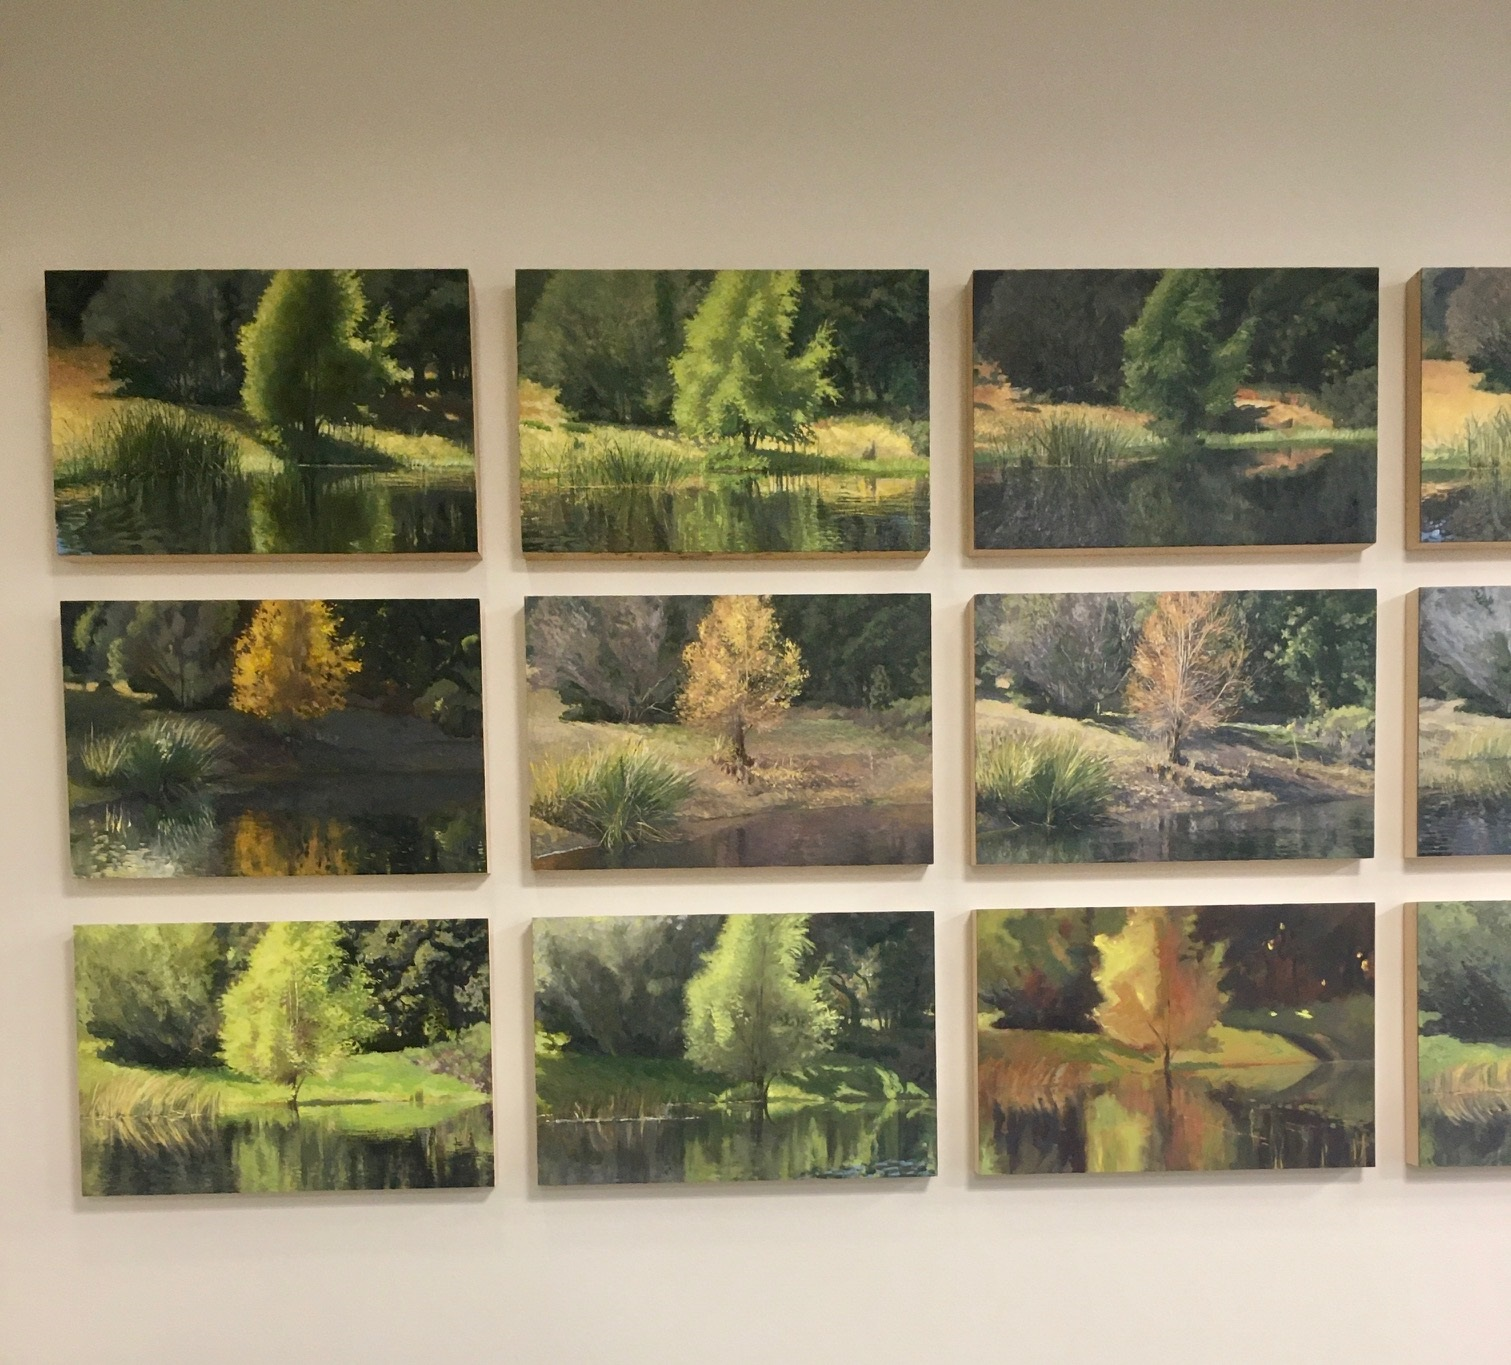 The Pond Series